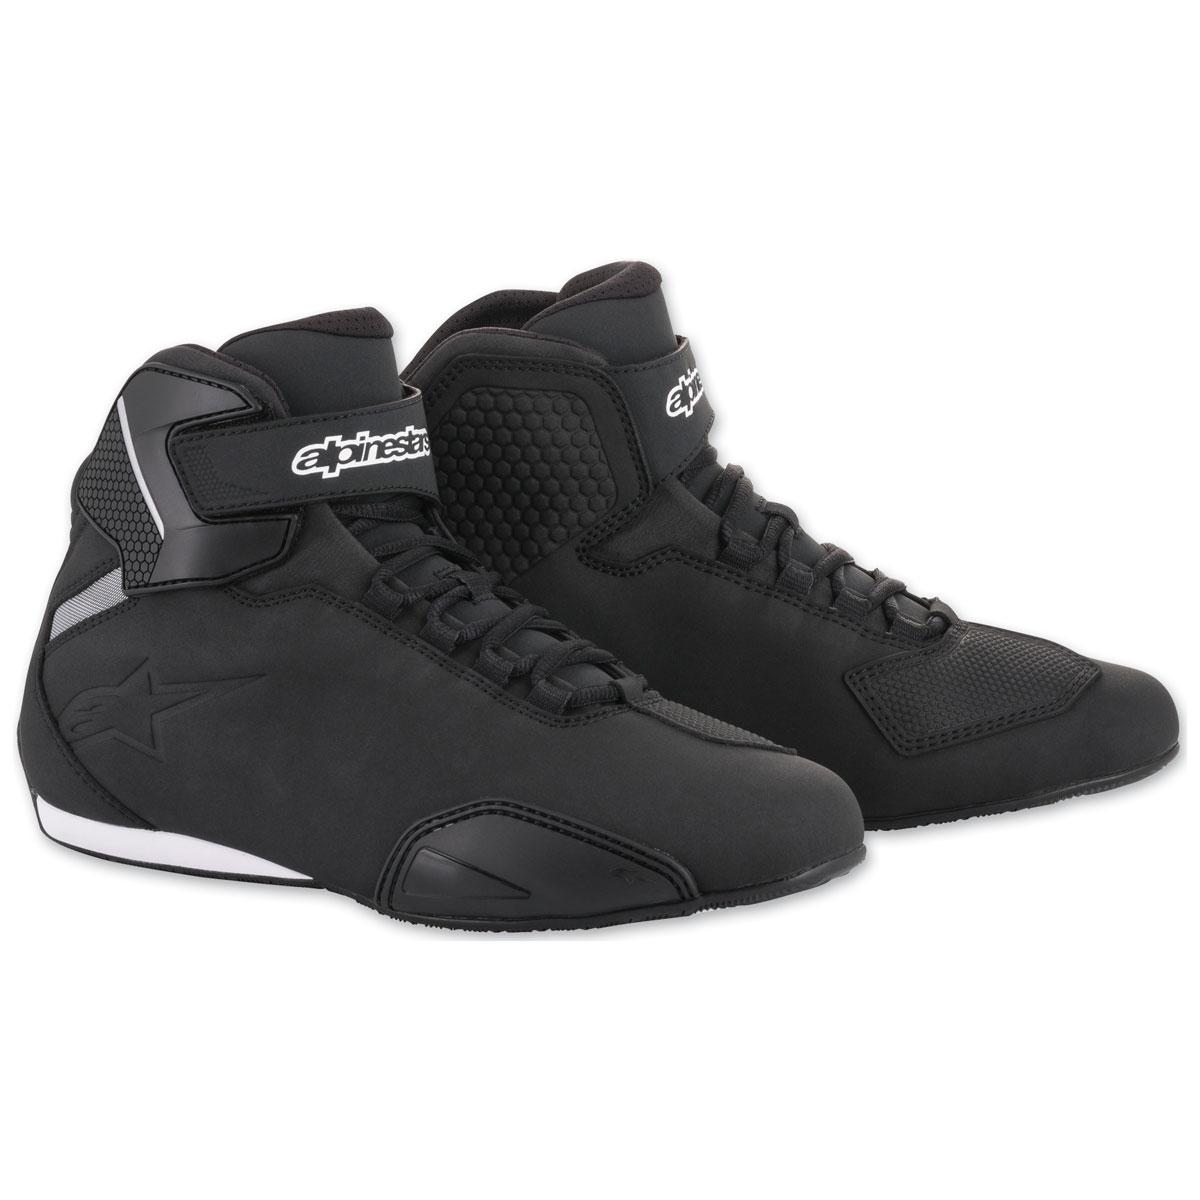 Alpinestars Men's Sektor Black Shoes